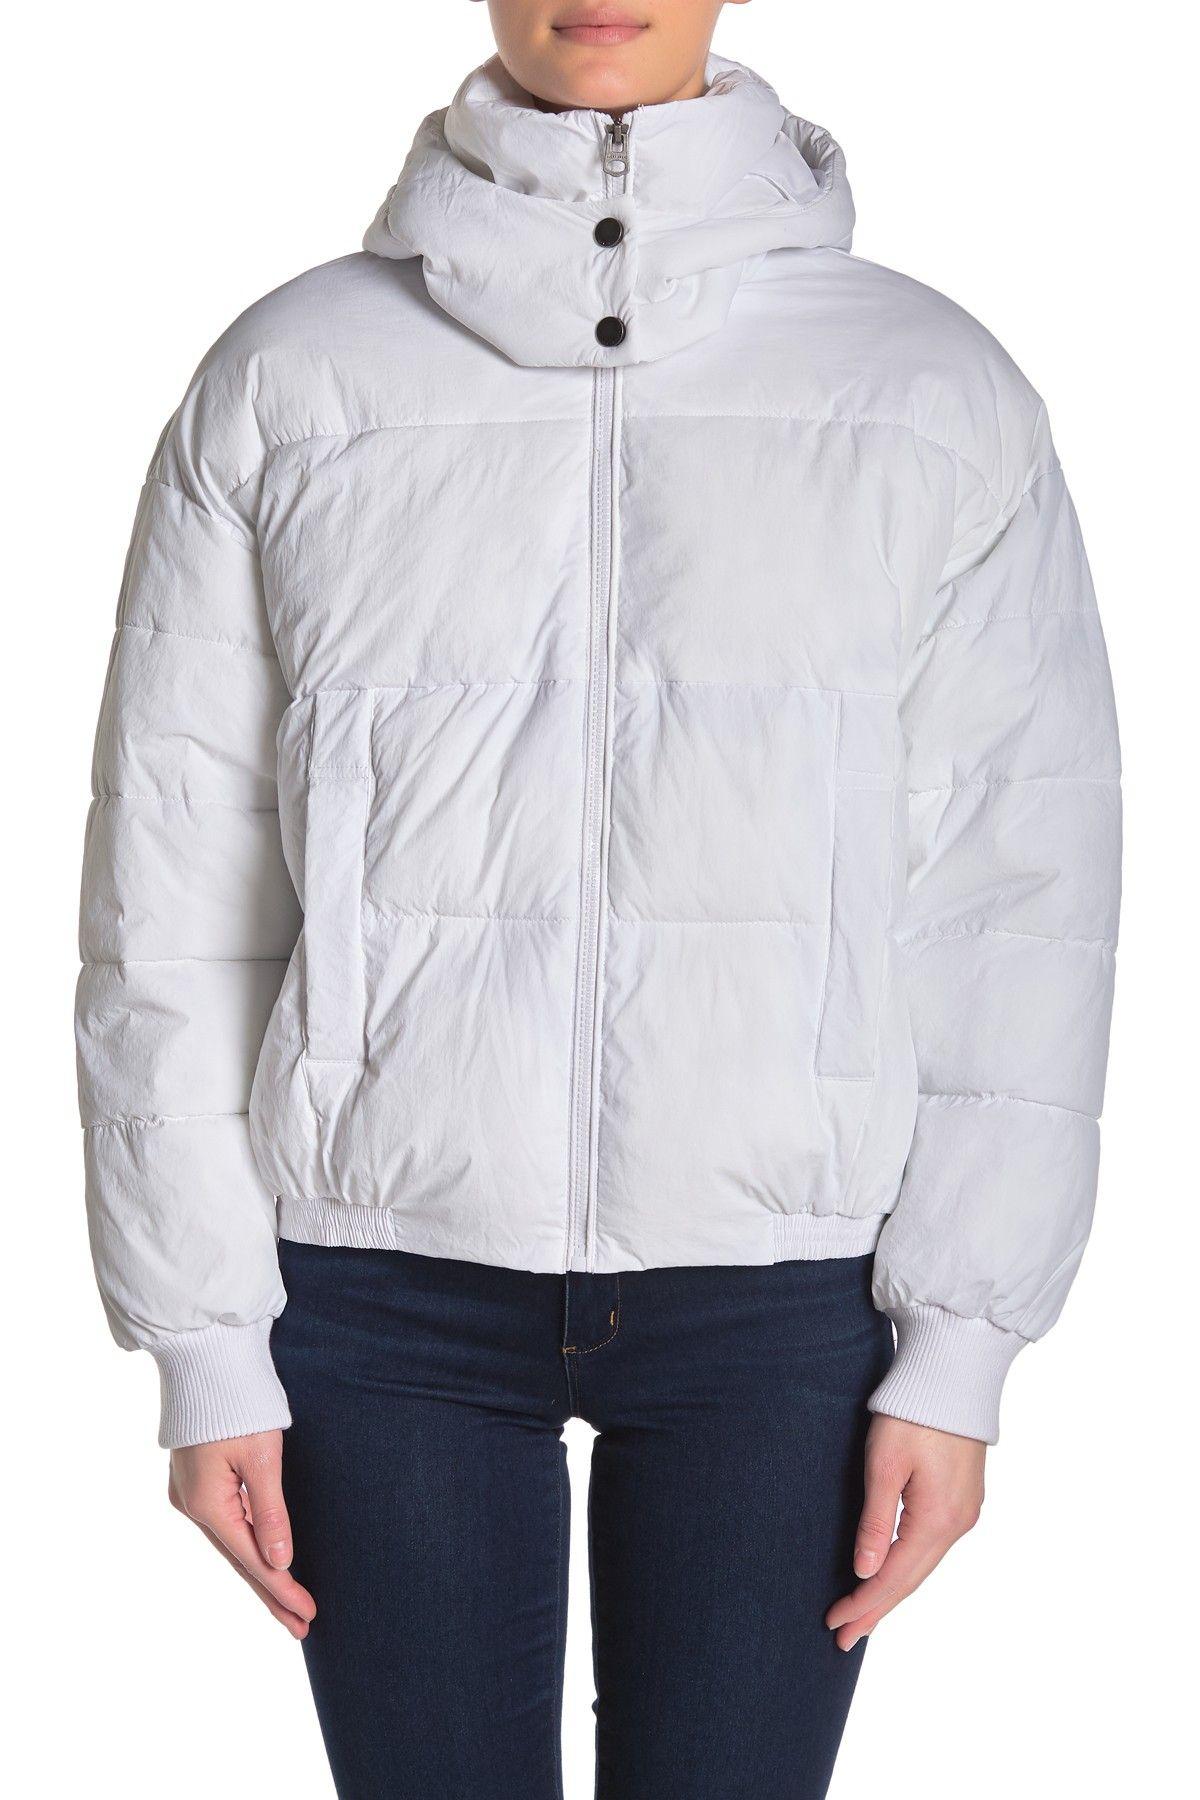 Lucky Brand Missy Short Puffer Jacket Nordstrom Rack Short Puffer Jacket Jackets Puffer Jackets [ 1800 x 1200 Pixel ]